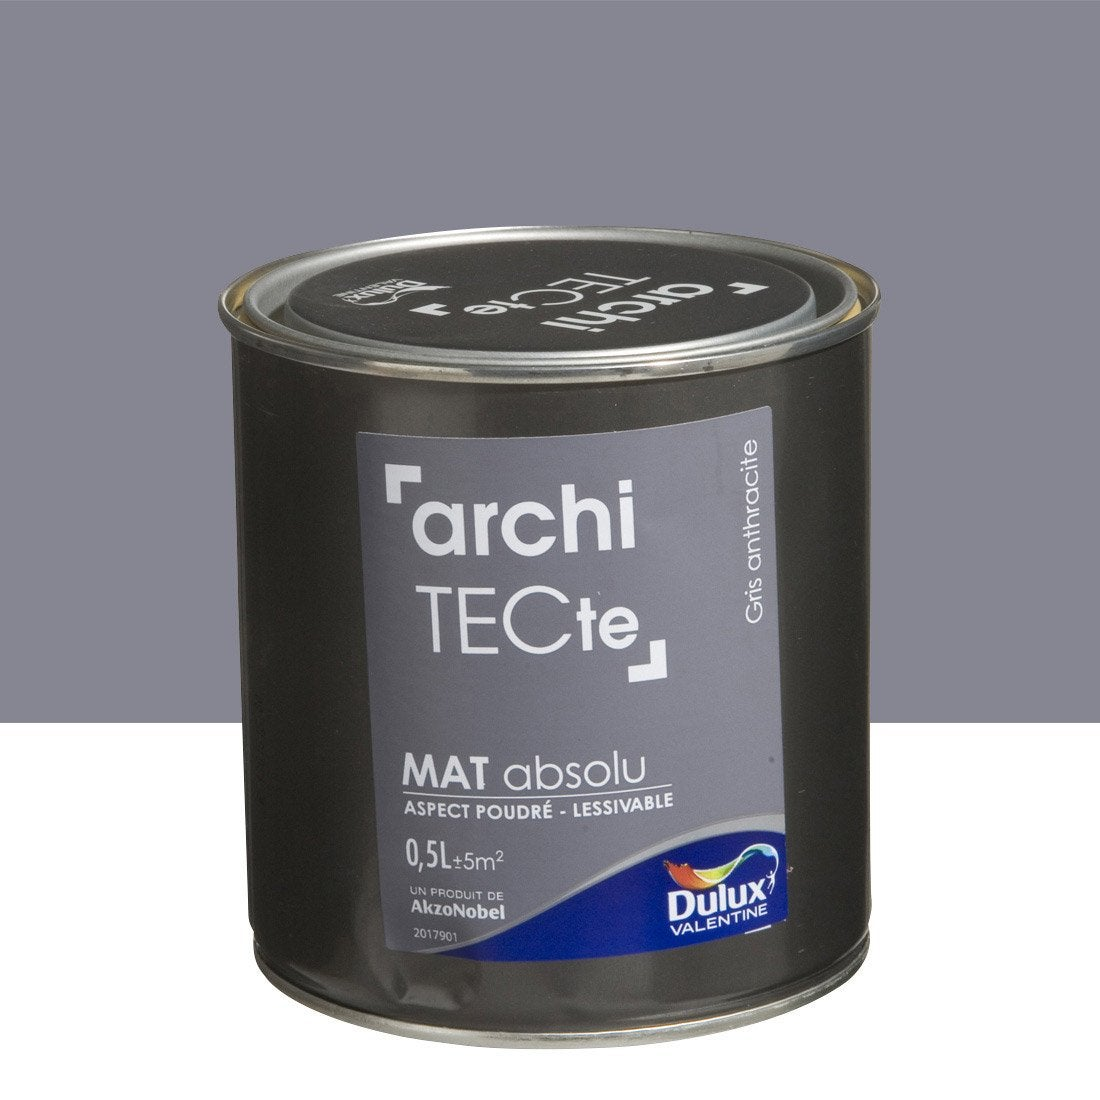 Peinture gris anthracite dulux valentine architecte 0 5 l for Peinture porte interieure gris anthracite